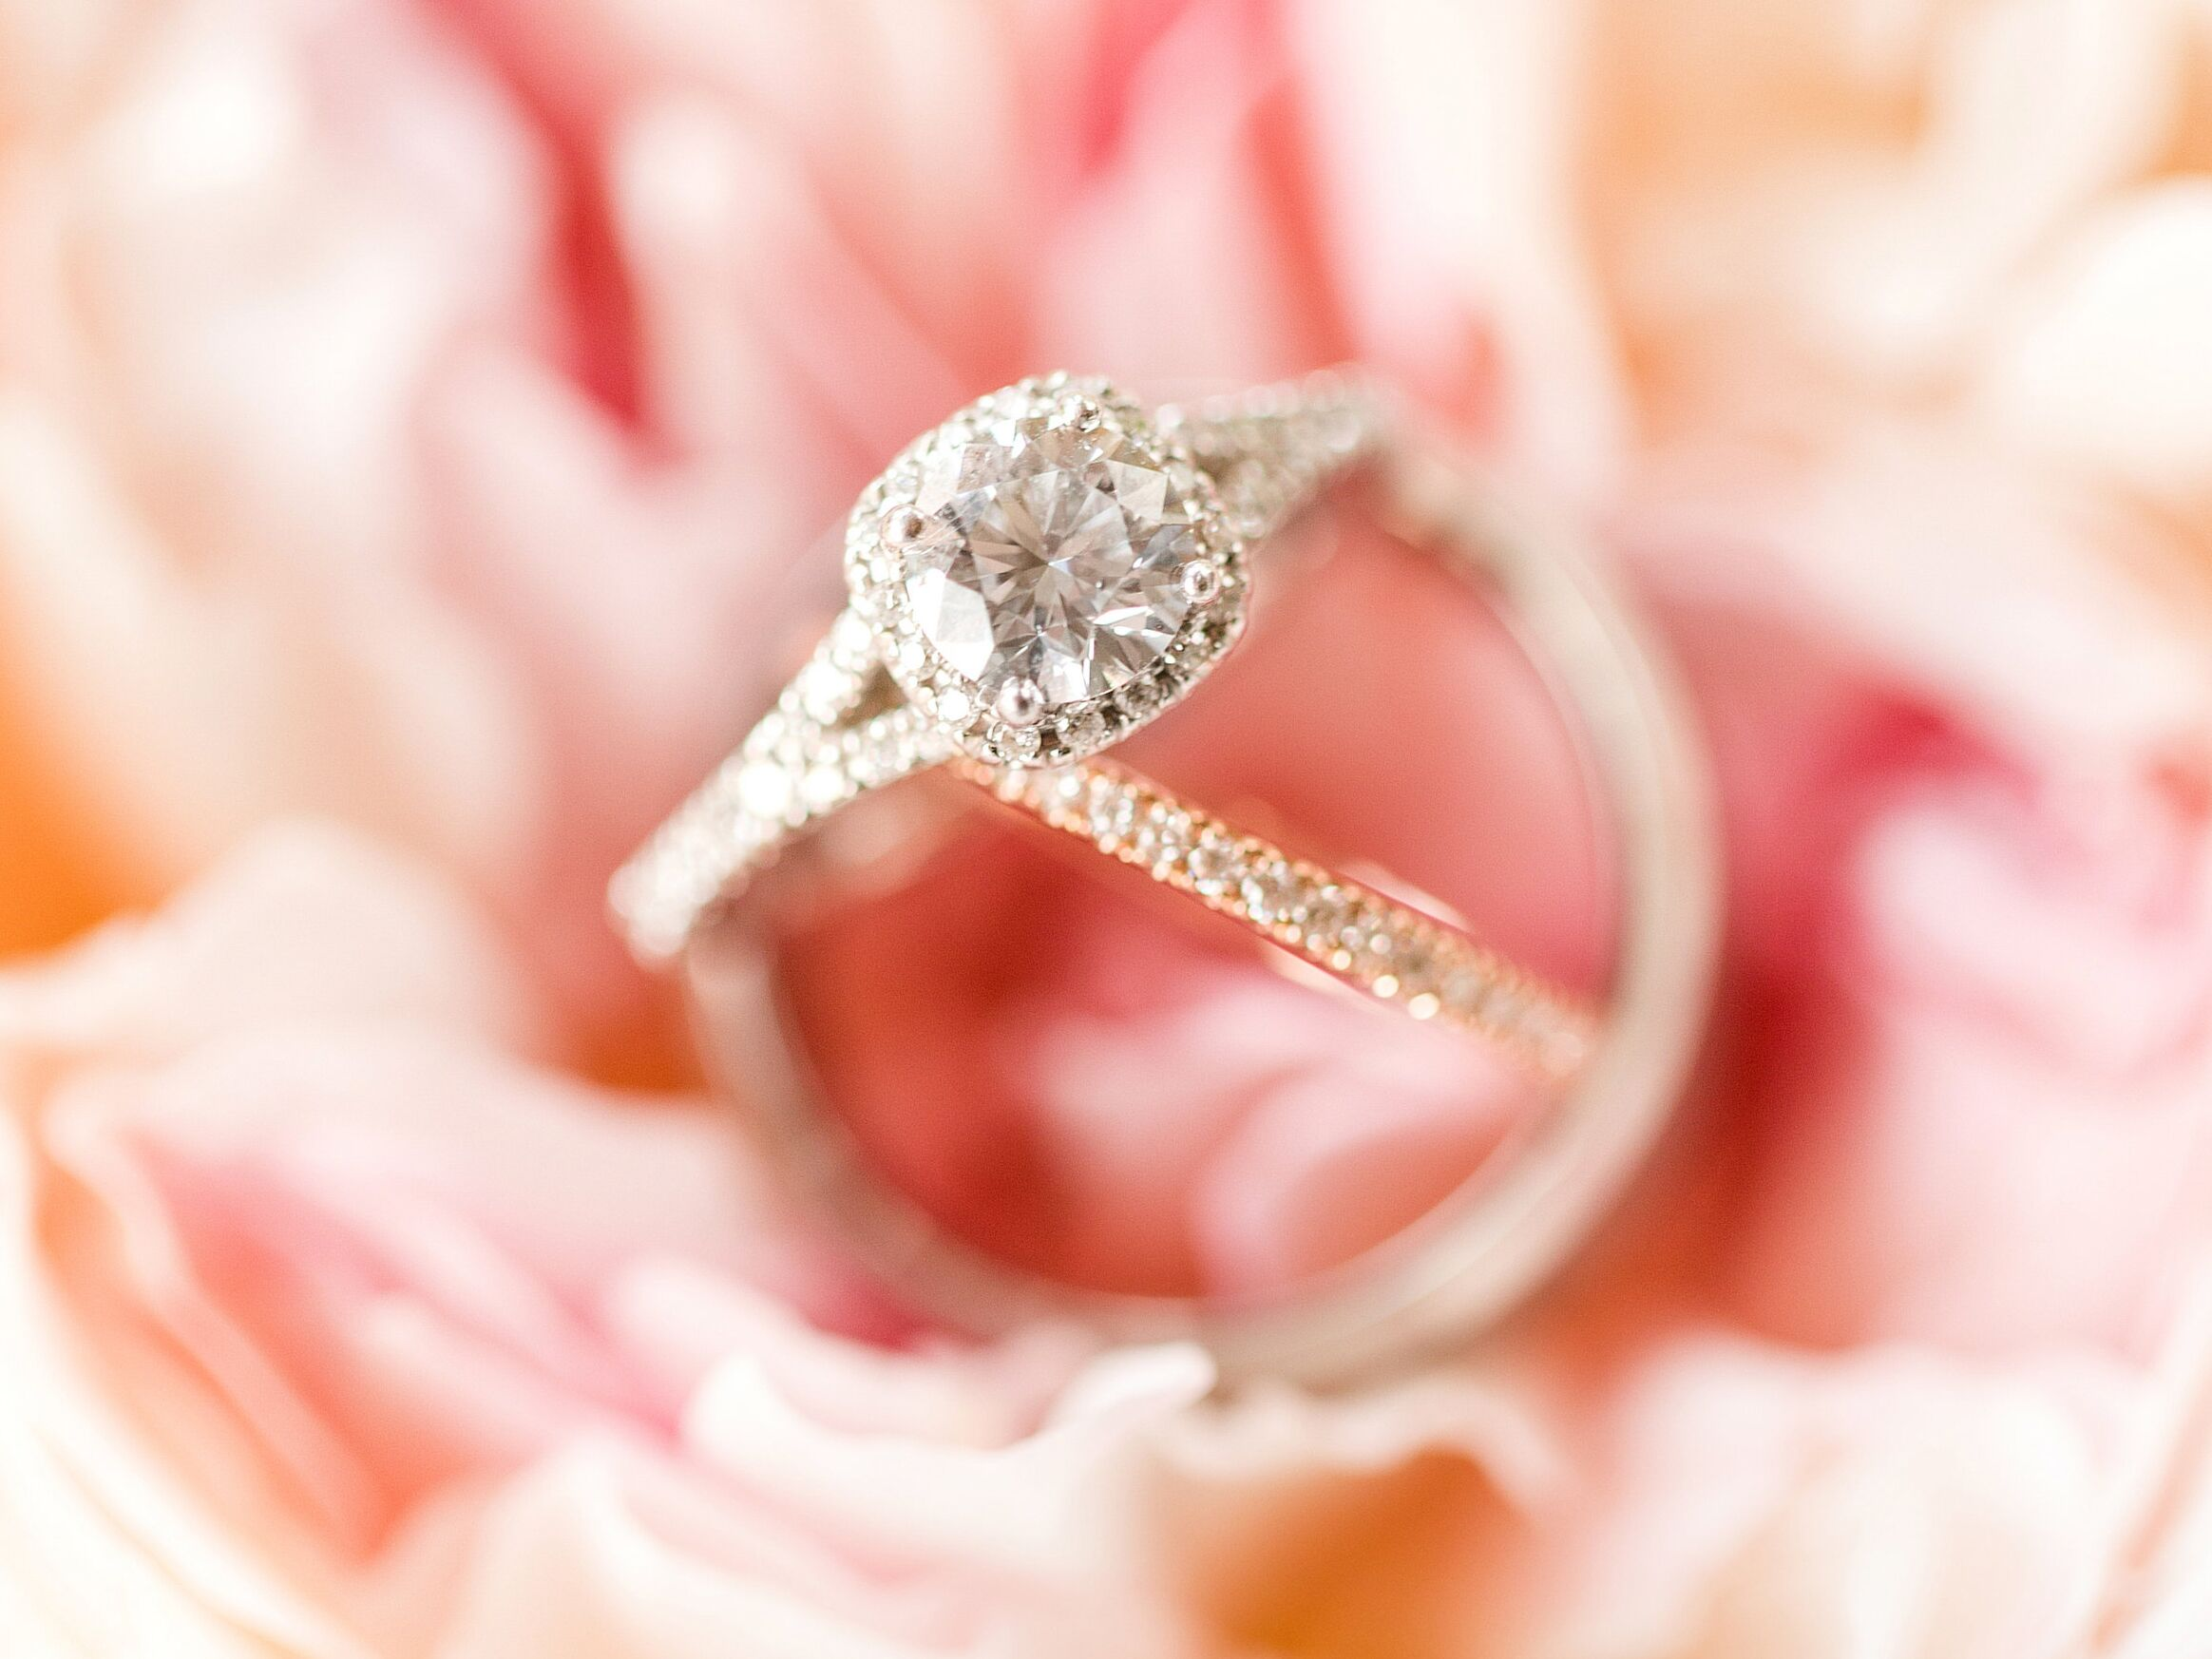 New fashion wedding ring: My dream wedding ring quiz